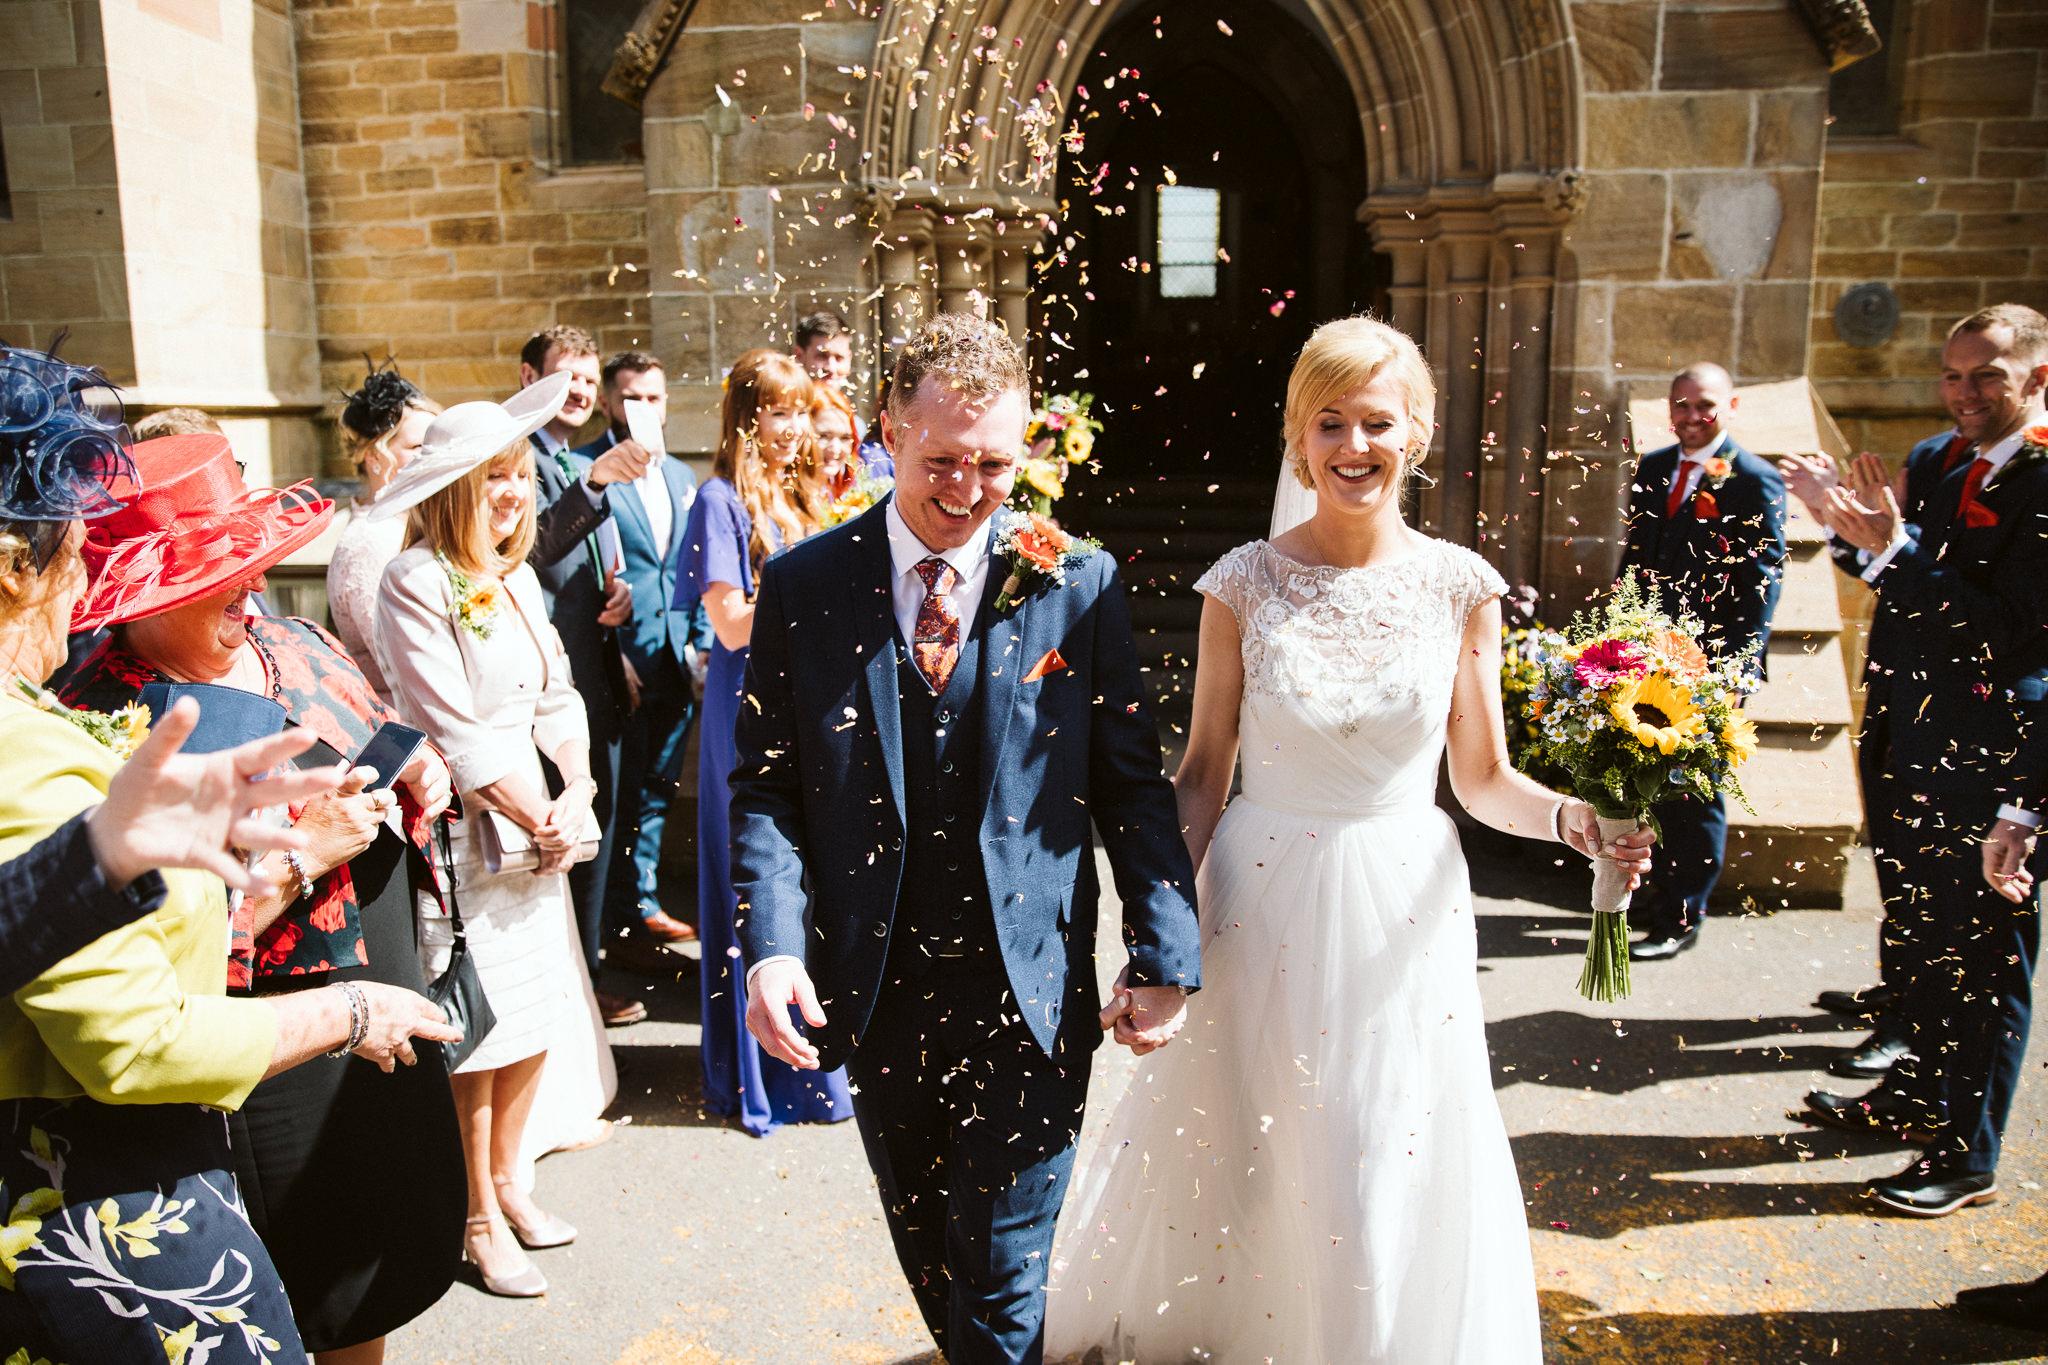 northside-farm-wedding-northumberland-margarita-hope (33).jpg